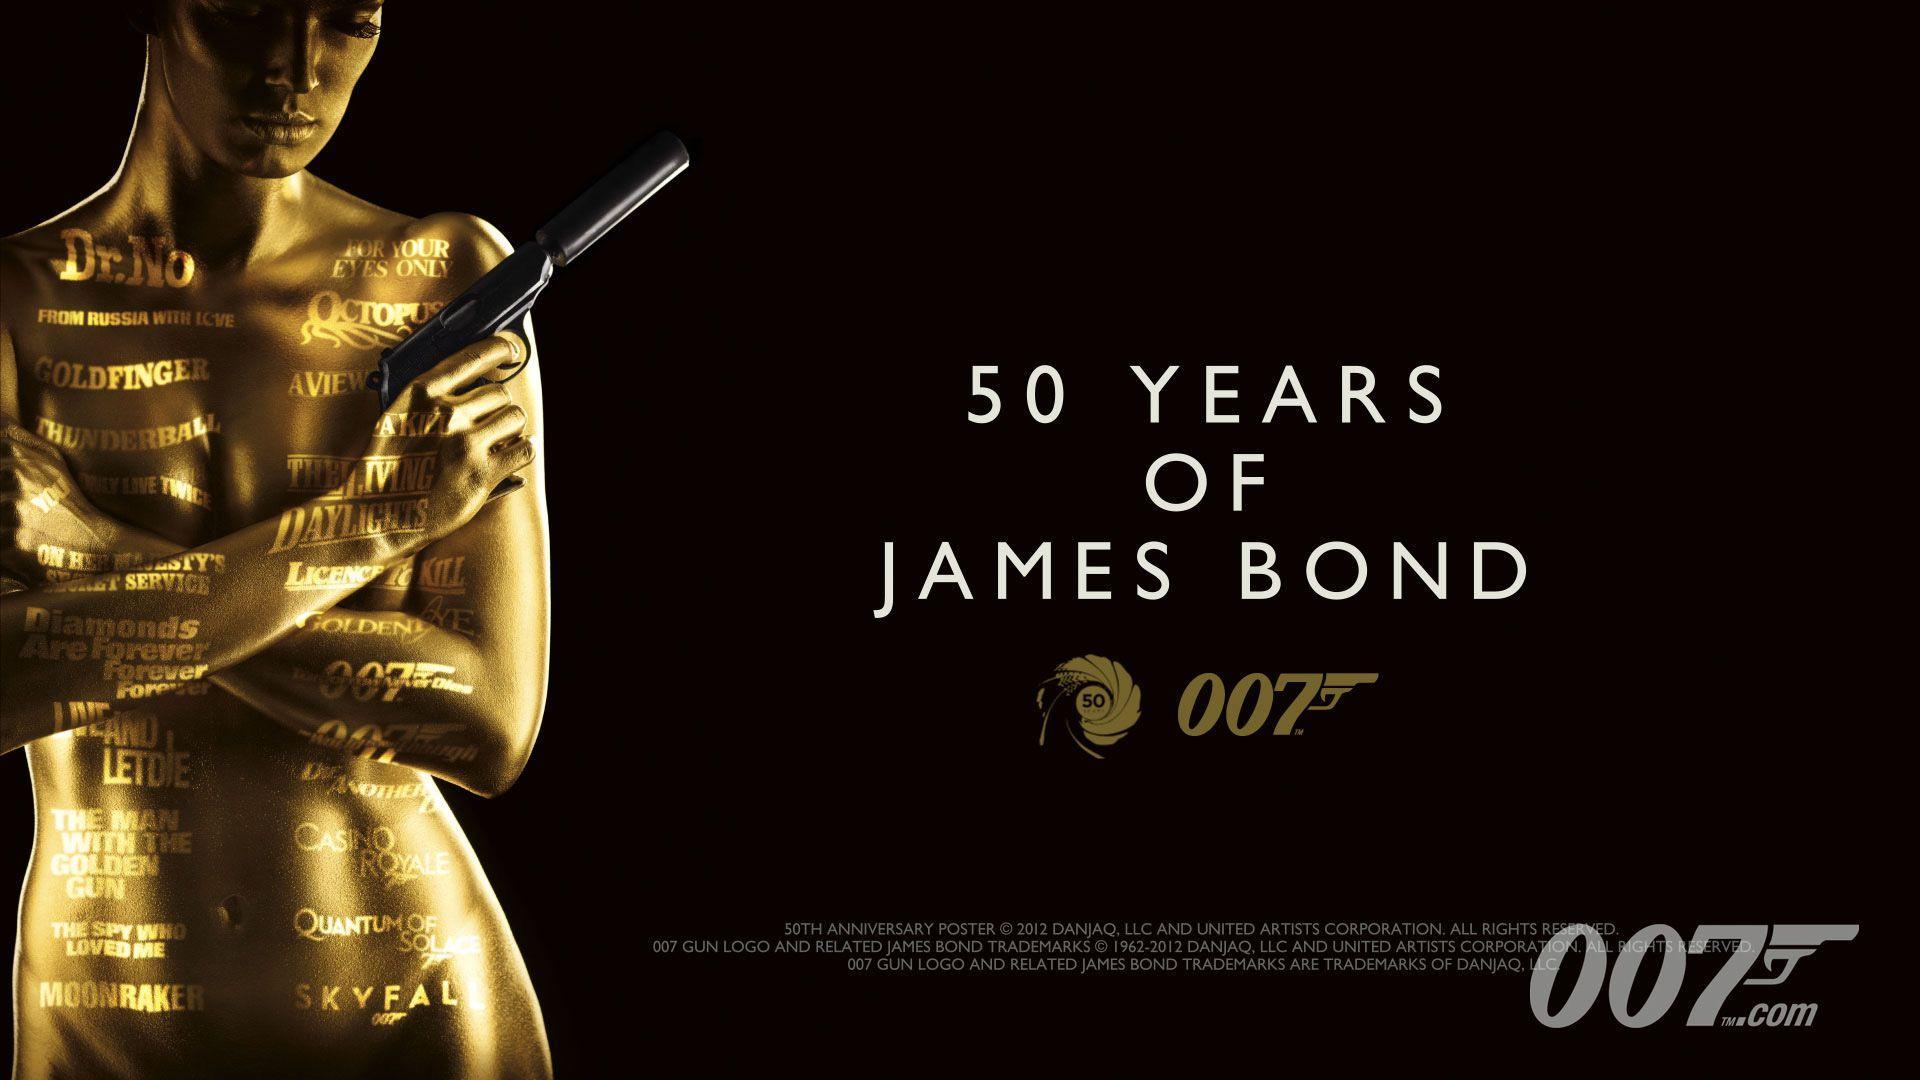 b2c27afb6983 James Bond 007 Logo Wallpapers - Wallpaper Cave